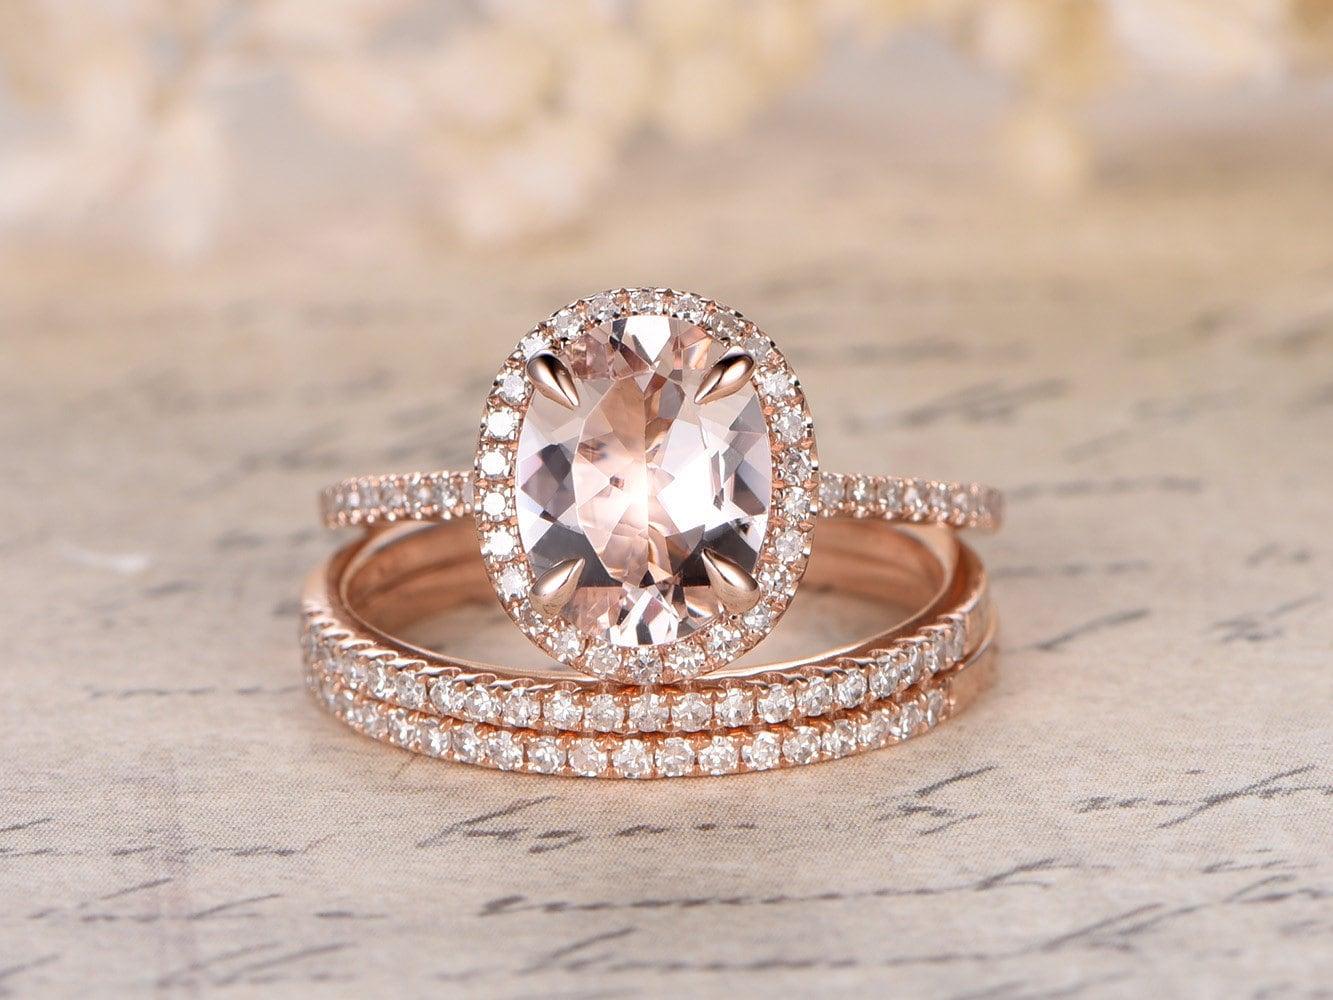 thin wedding band thin wedding bands Valentine s present mm Oval Cut Morganite Ring Pink Morganite Engagement Ring Set Thin Diamond Wedding Band K Gold 3 Wedding Rings Set